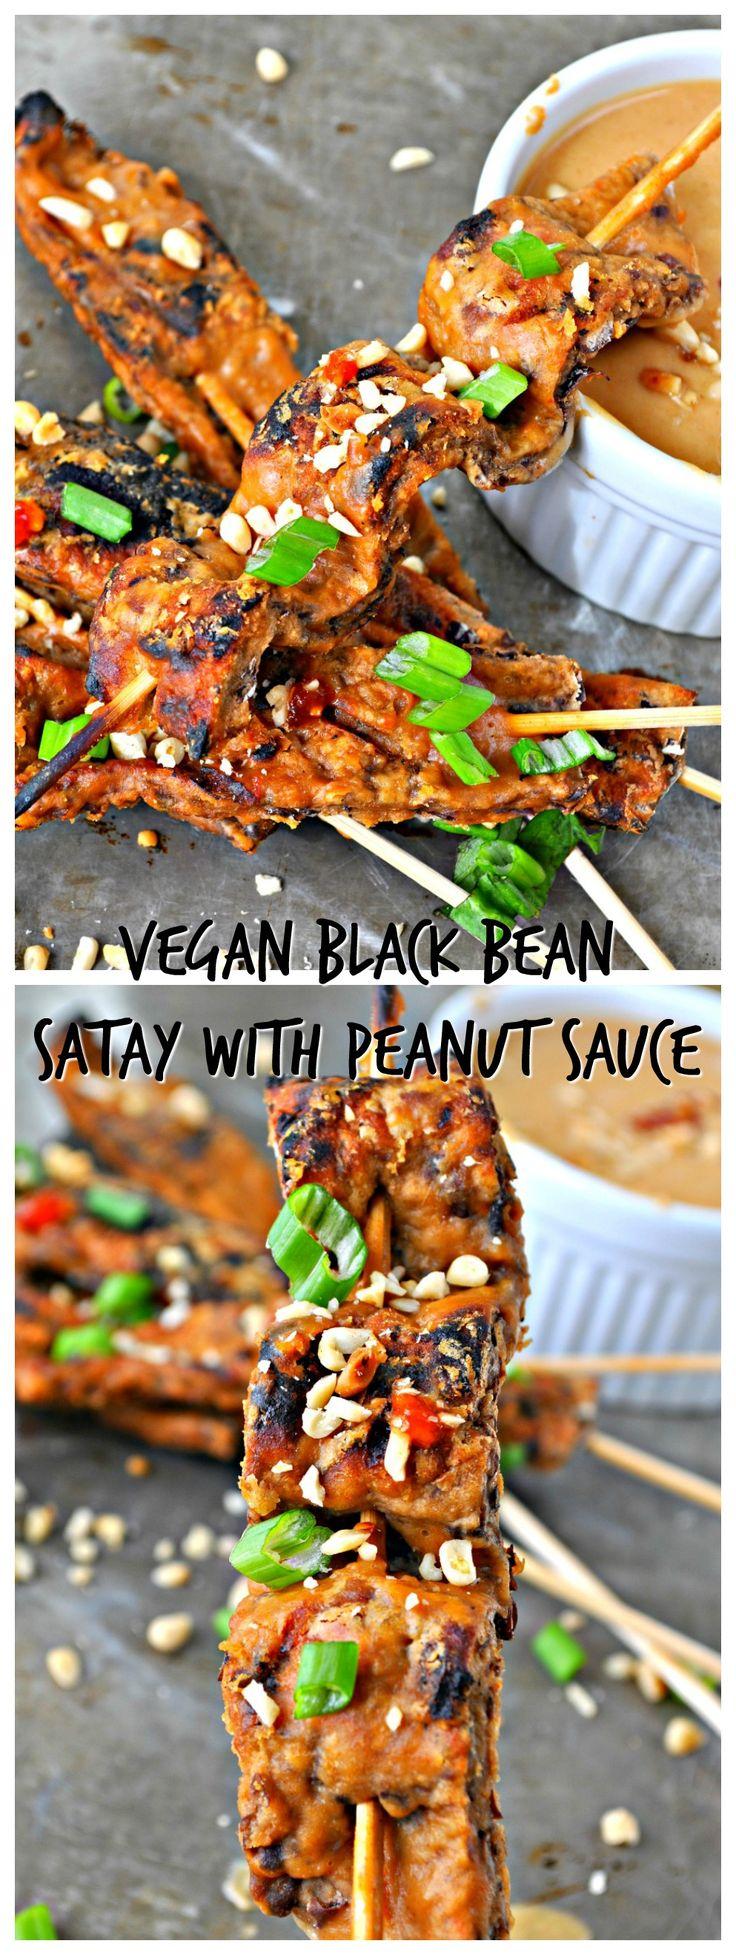 Vegan Black Bean Satay with Peanut Sauce